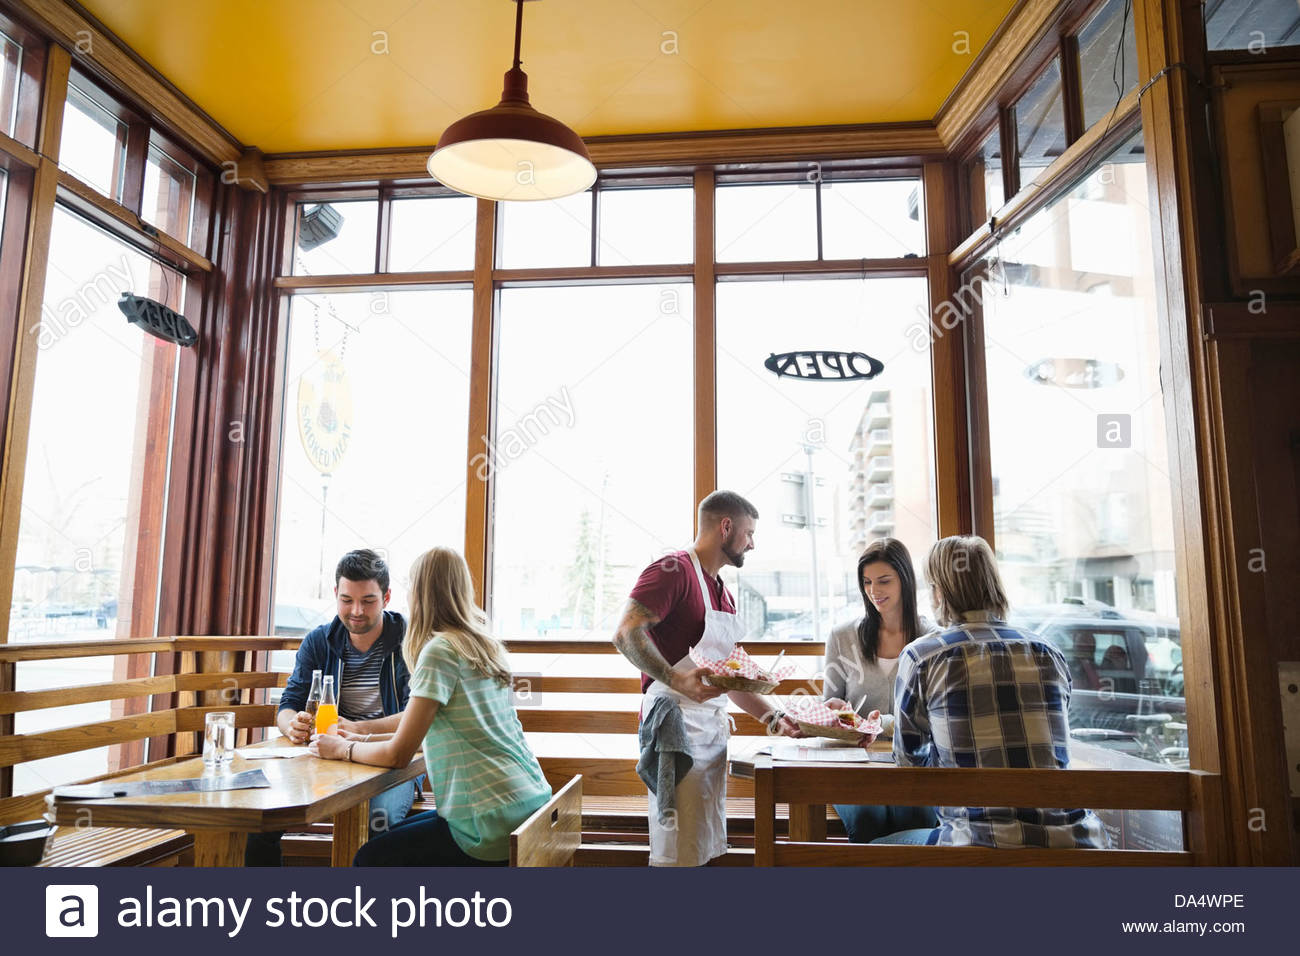 Männliche Deli Besitzer Speisen an Kunden Stockbild